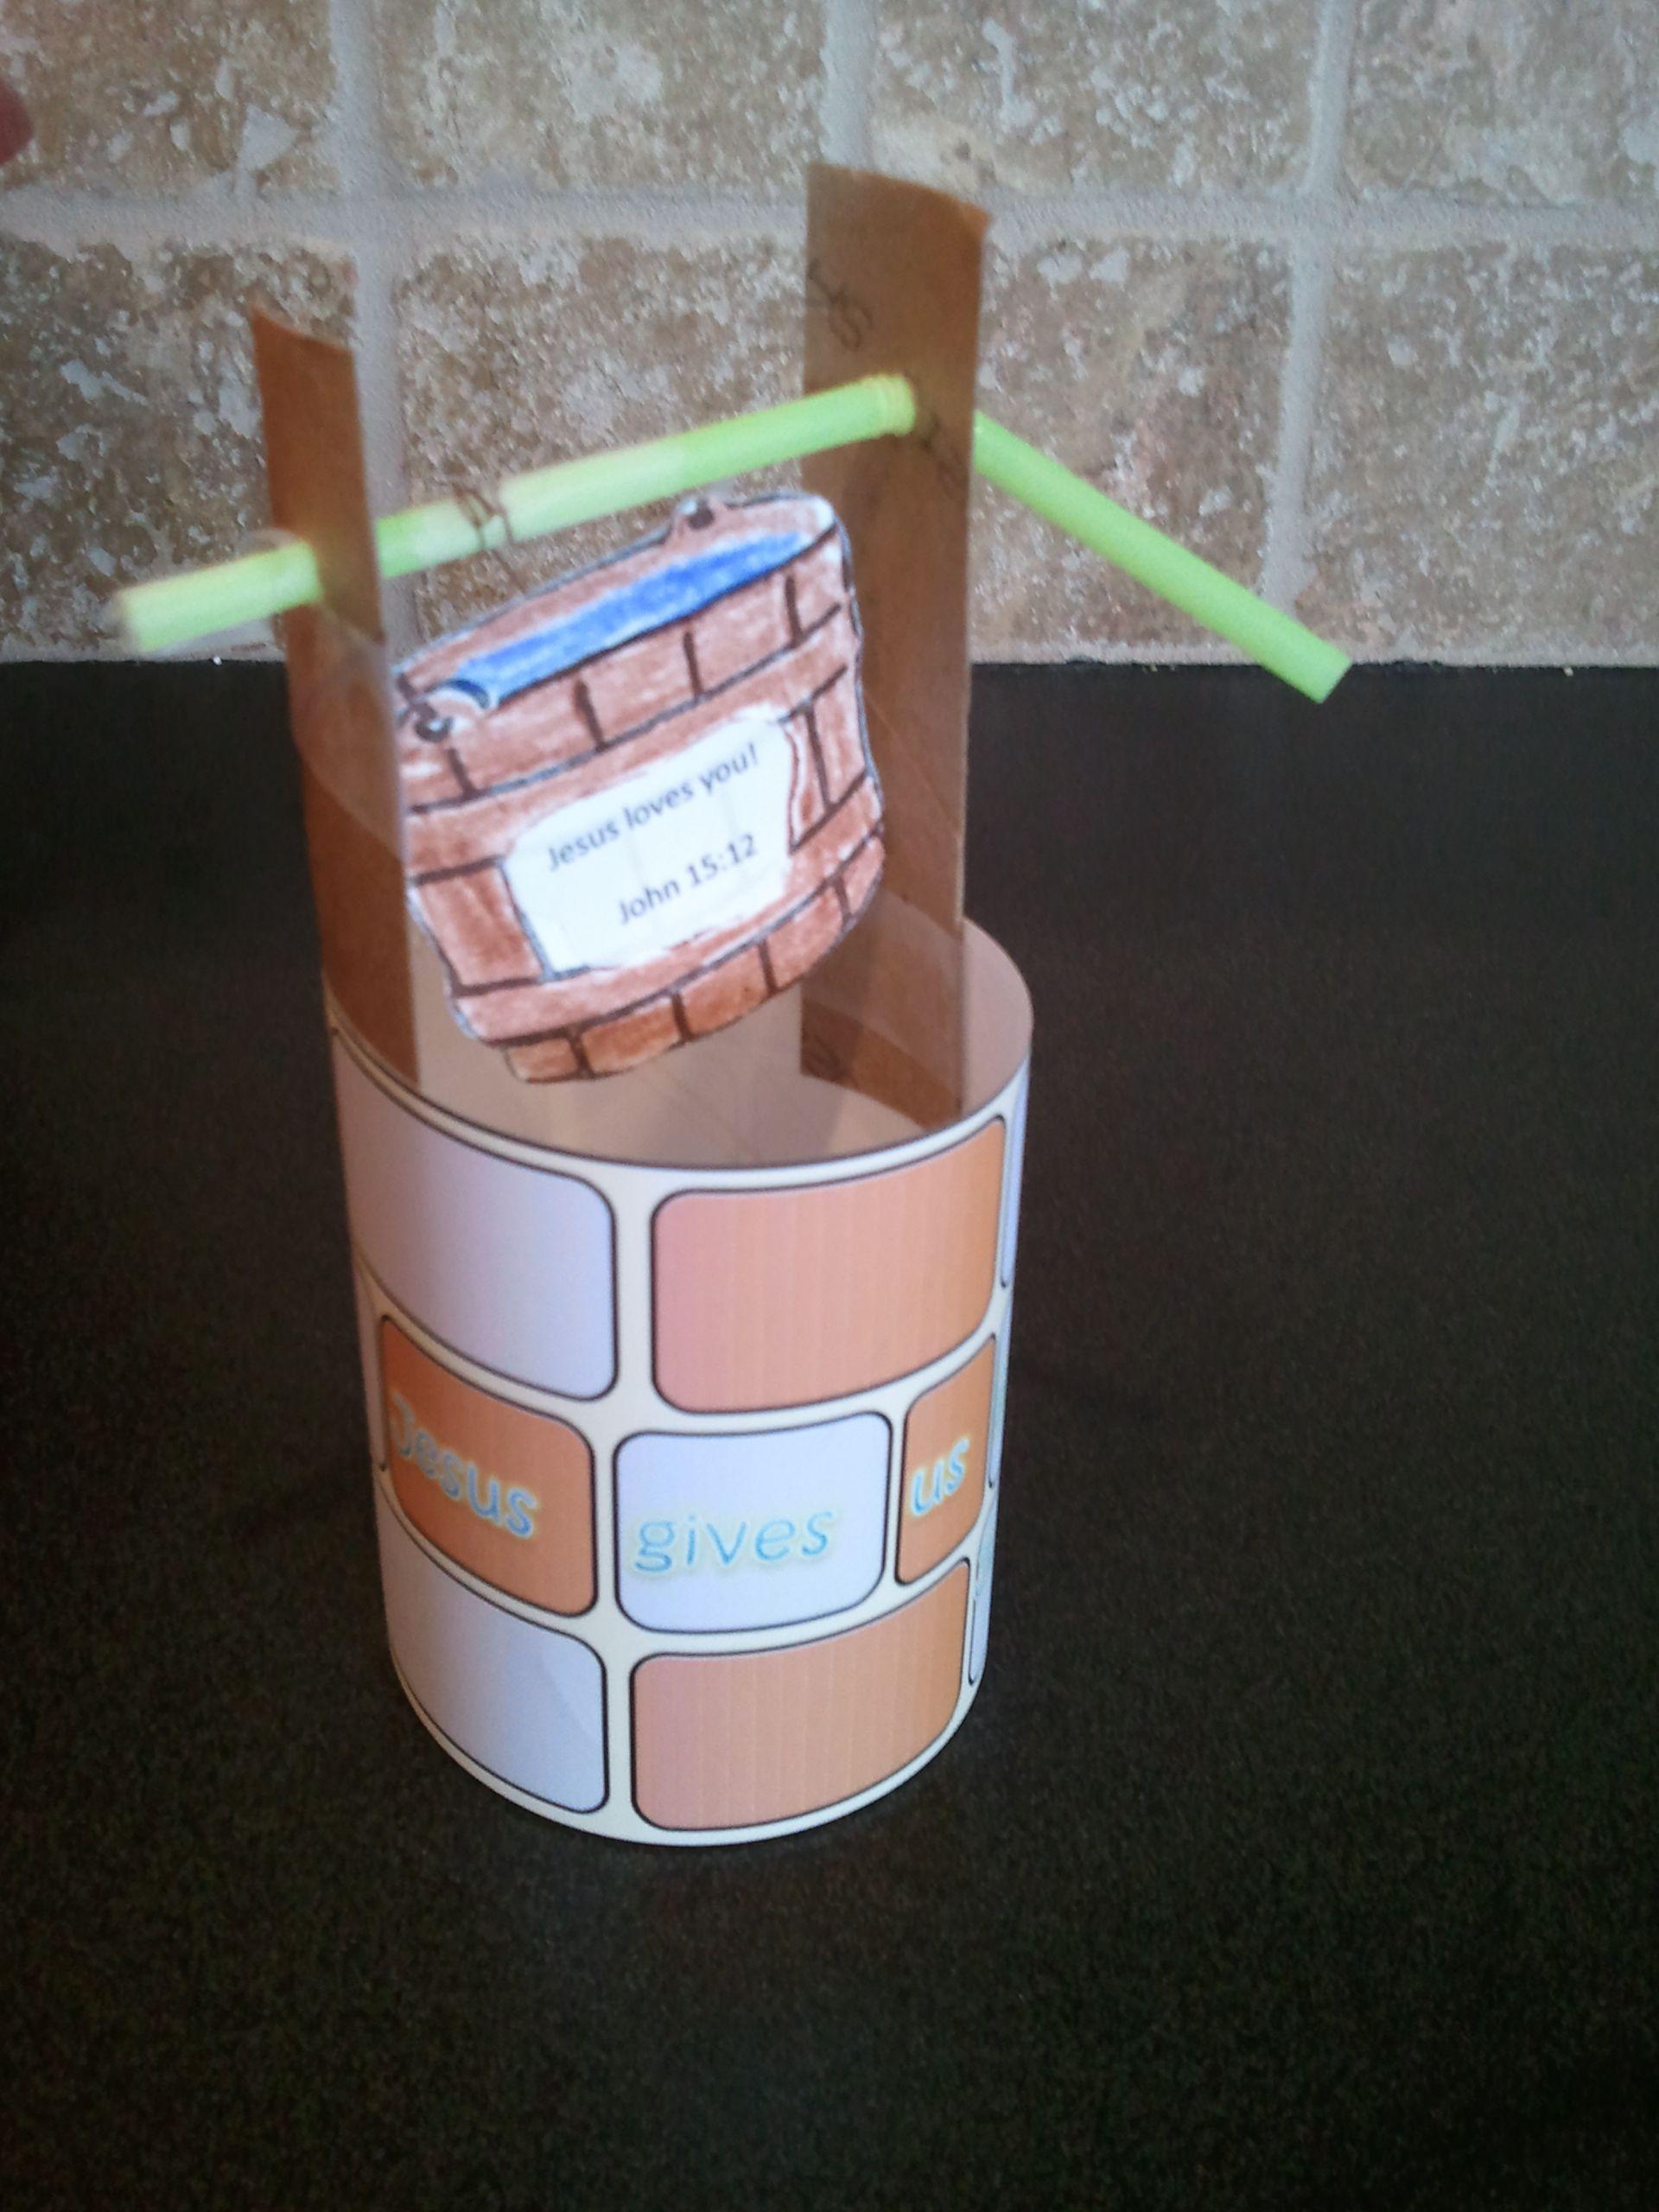 Box plastic strip church of christ